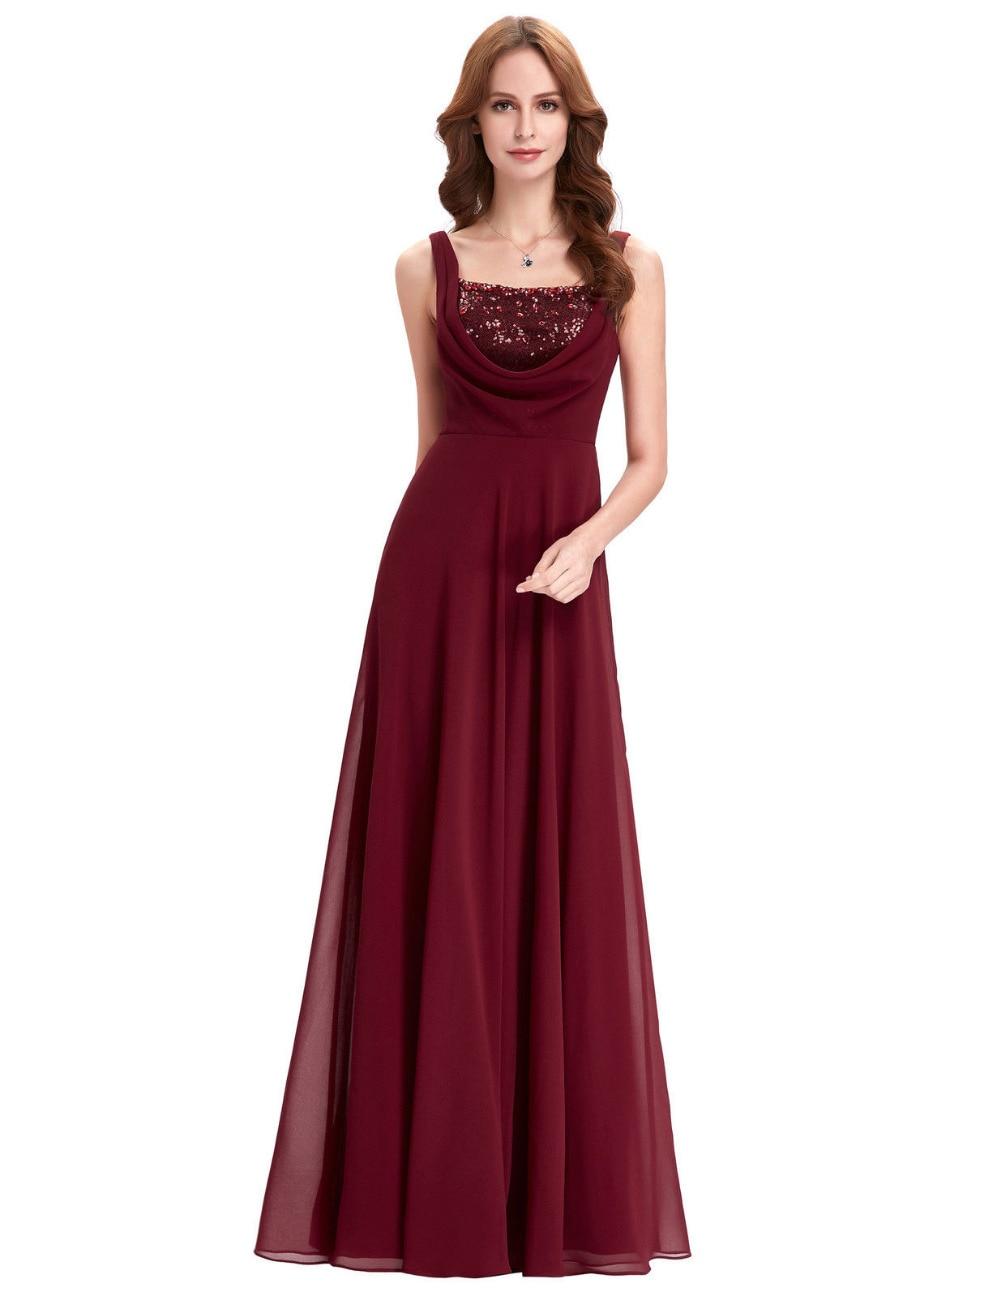 Online Get Cheap Sequin Evening Gown -Aliexpress.com | Alibaba Group